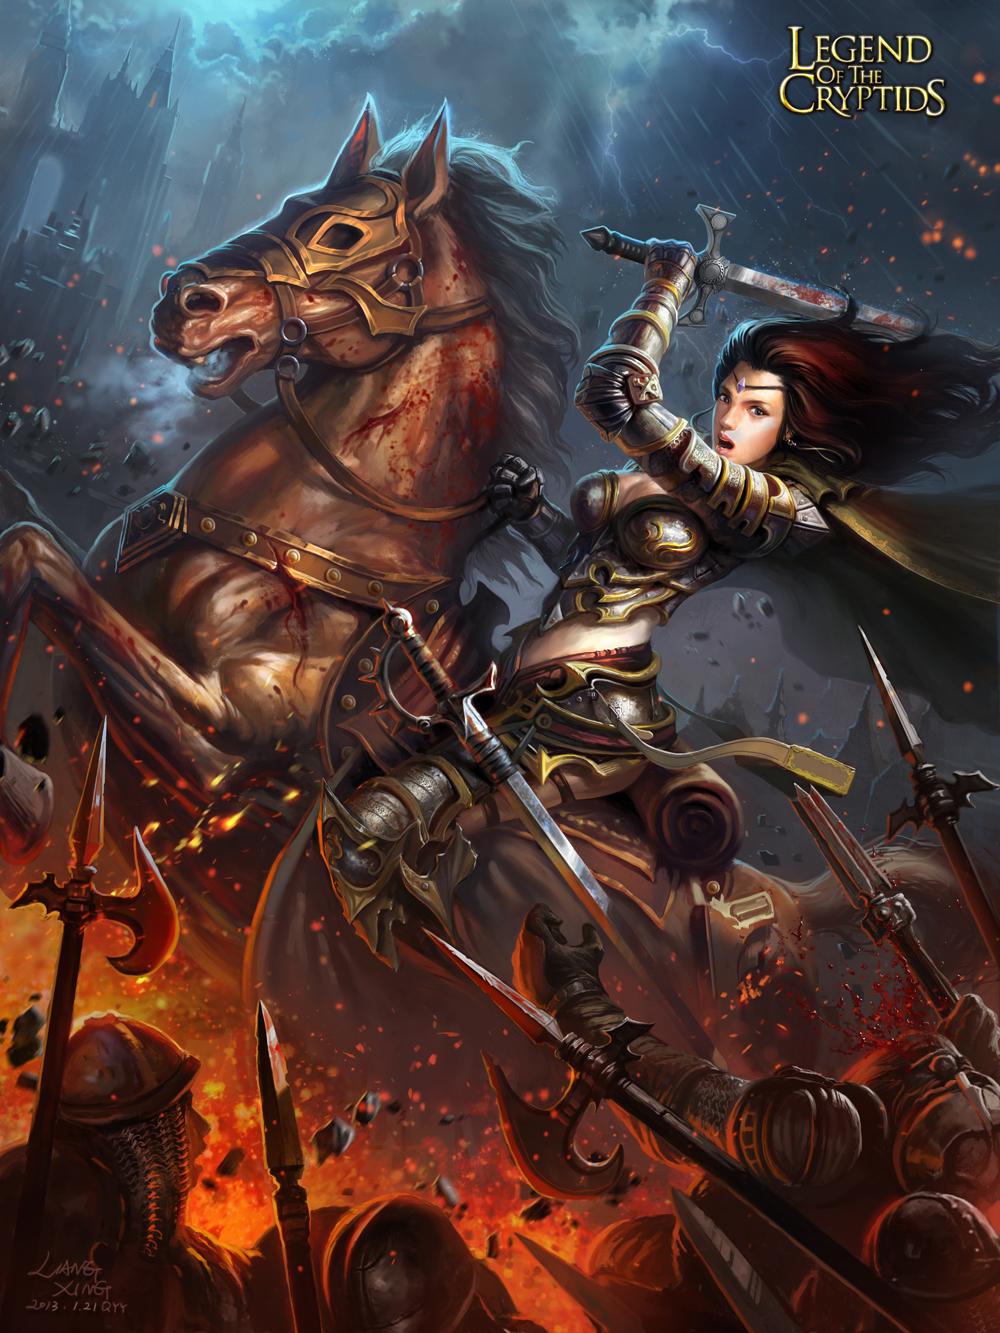 Thief leader-adv by liangxinxin